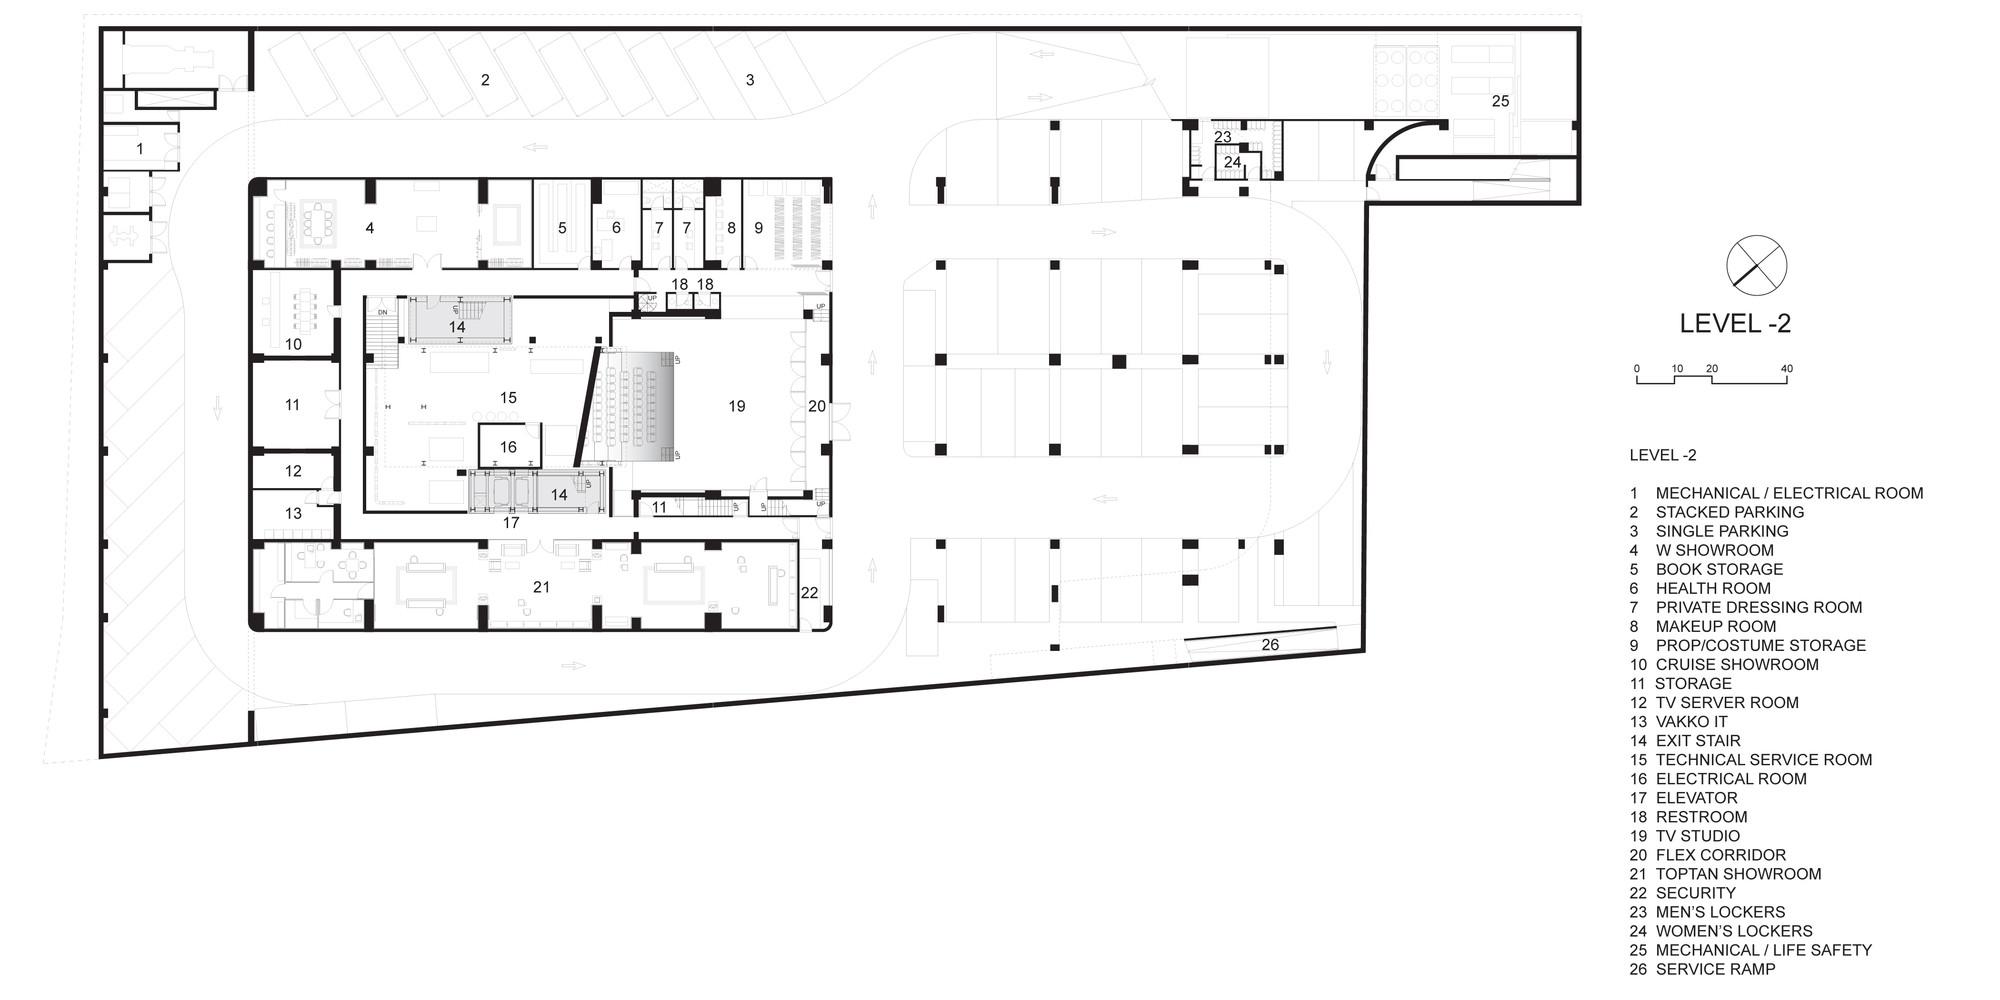 Gallery of vakko headquarters and power media center rex for Media center plans